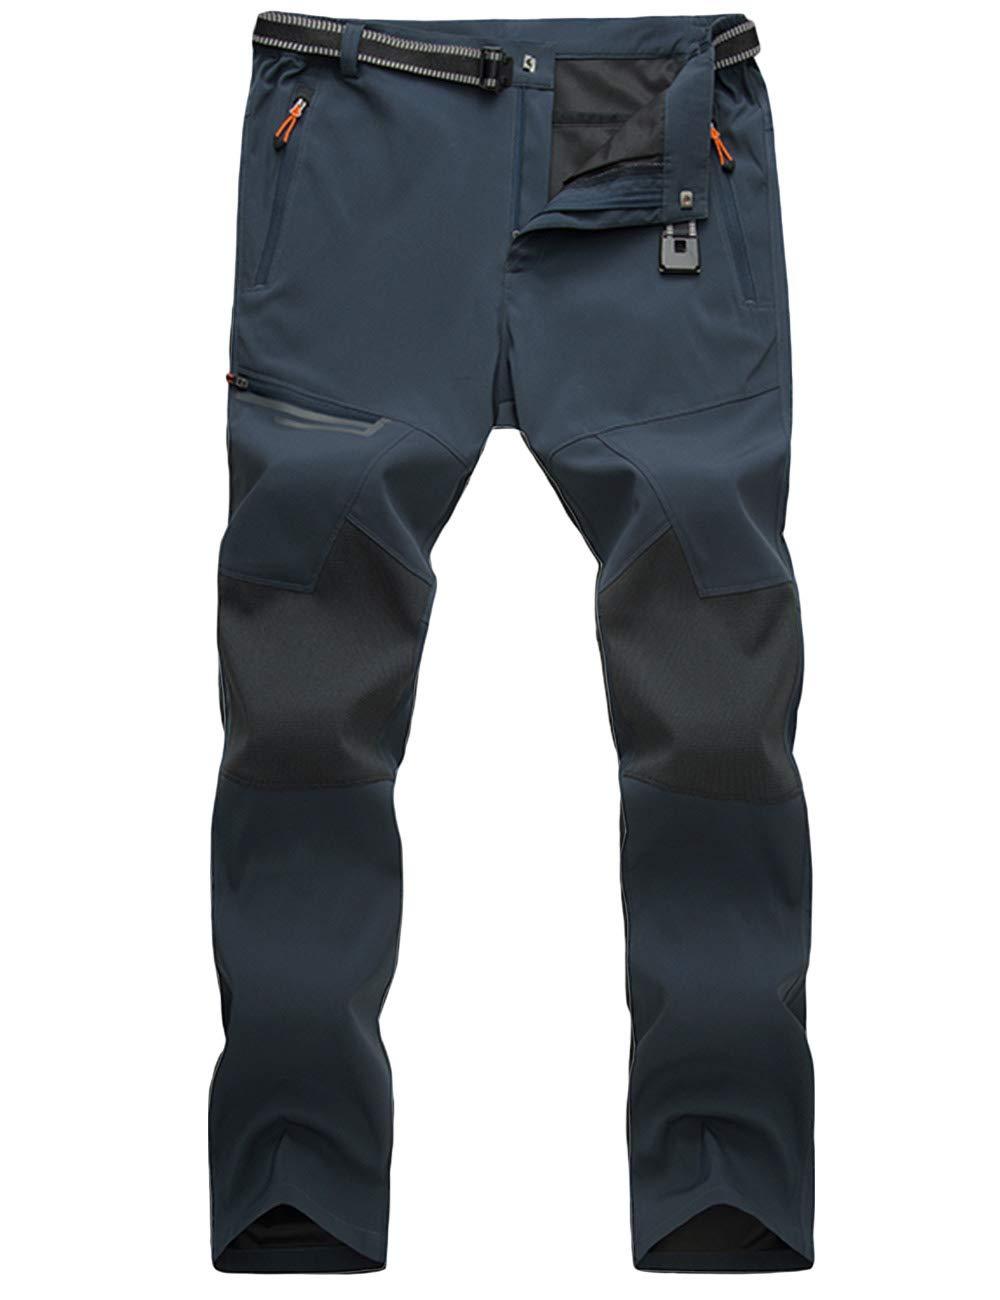 MAGCOMSEN Breathable Pants Men Spring Pants